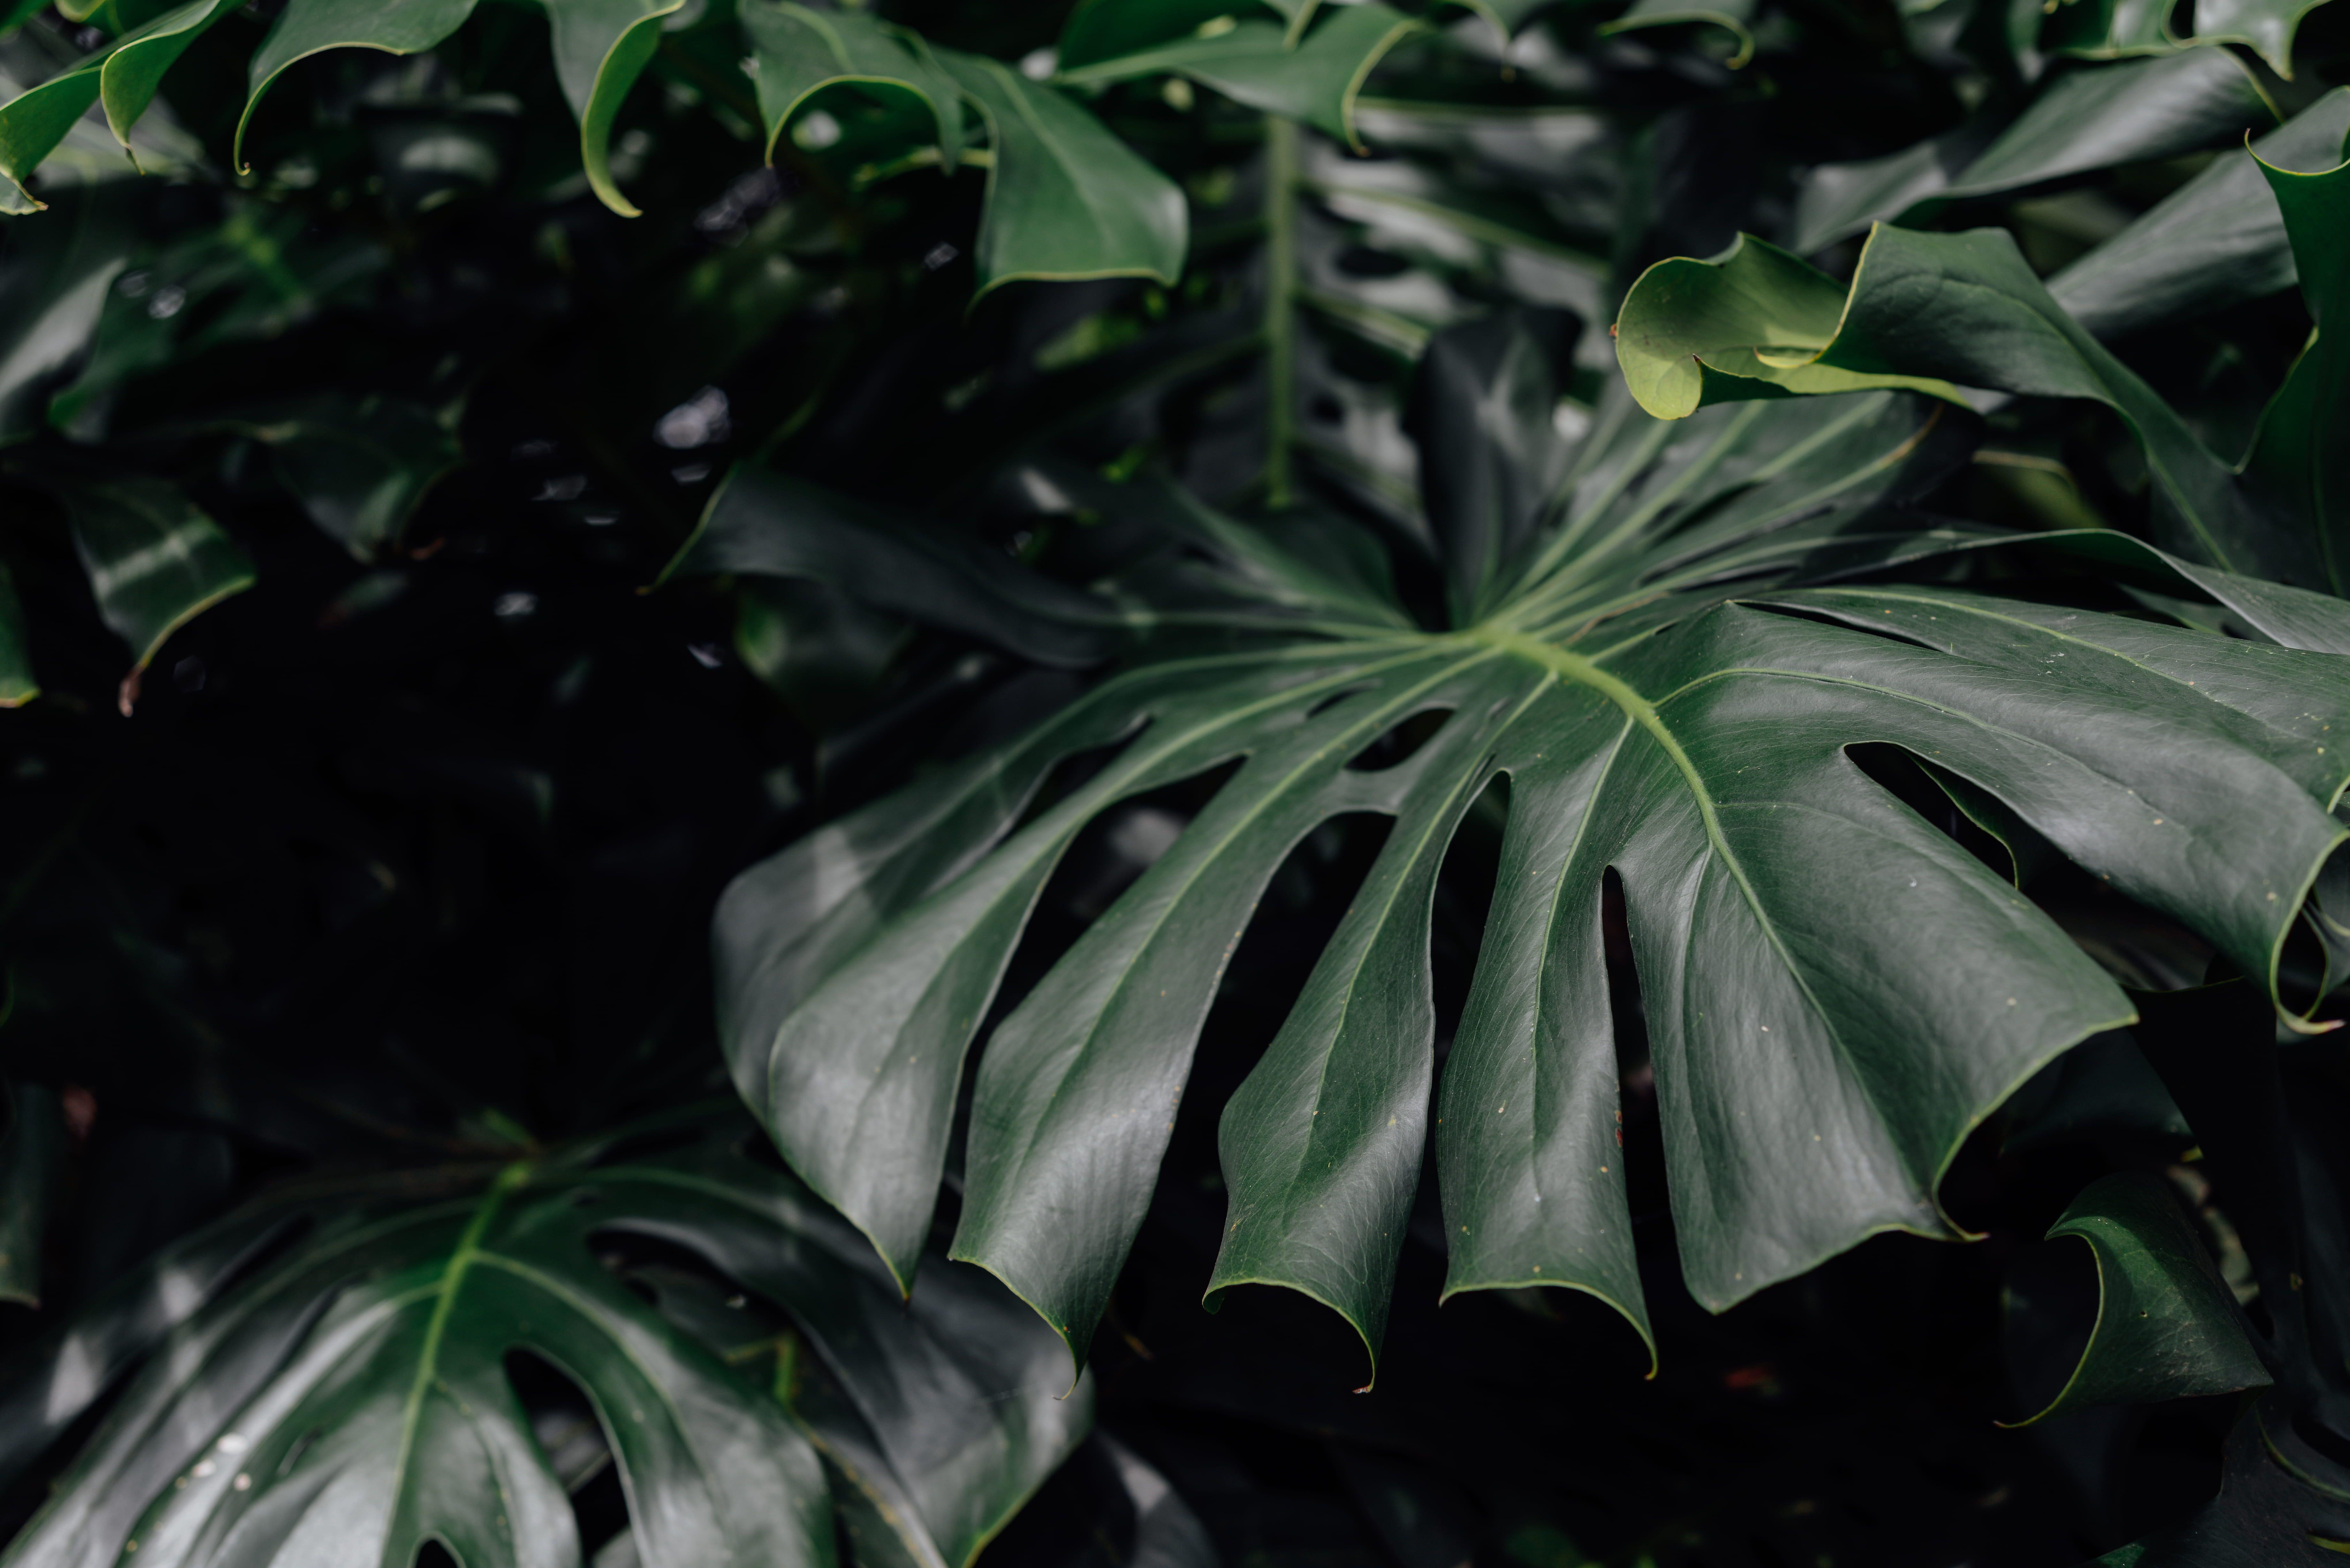 green leafed plant plant leaf flower blossom united